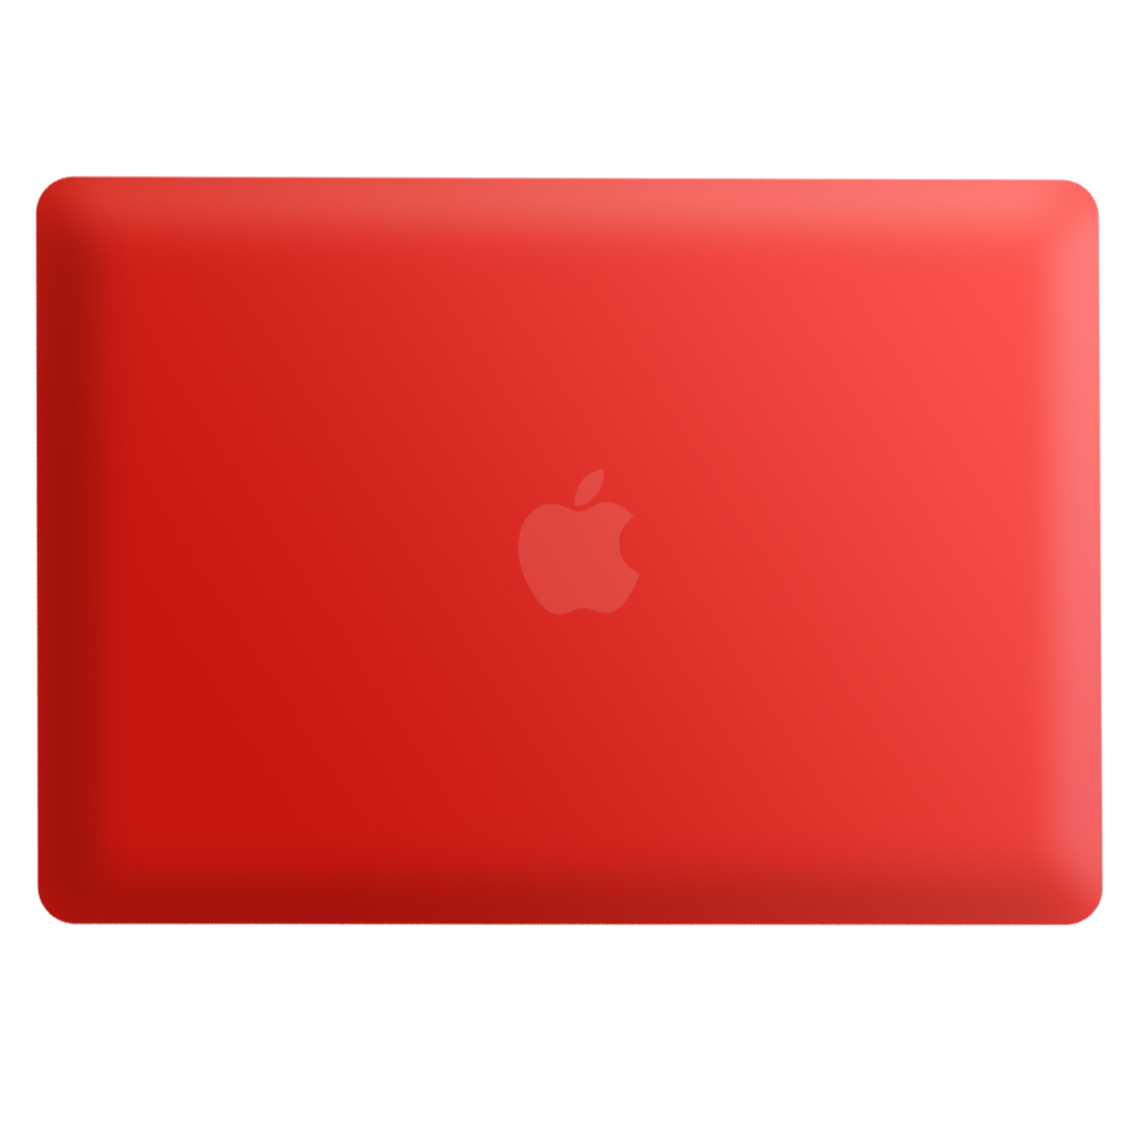 Neon Party Macbook Case - Pro 13'' 2012-2015